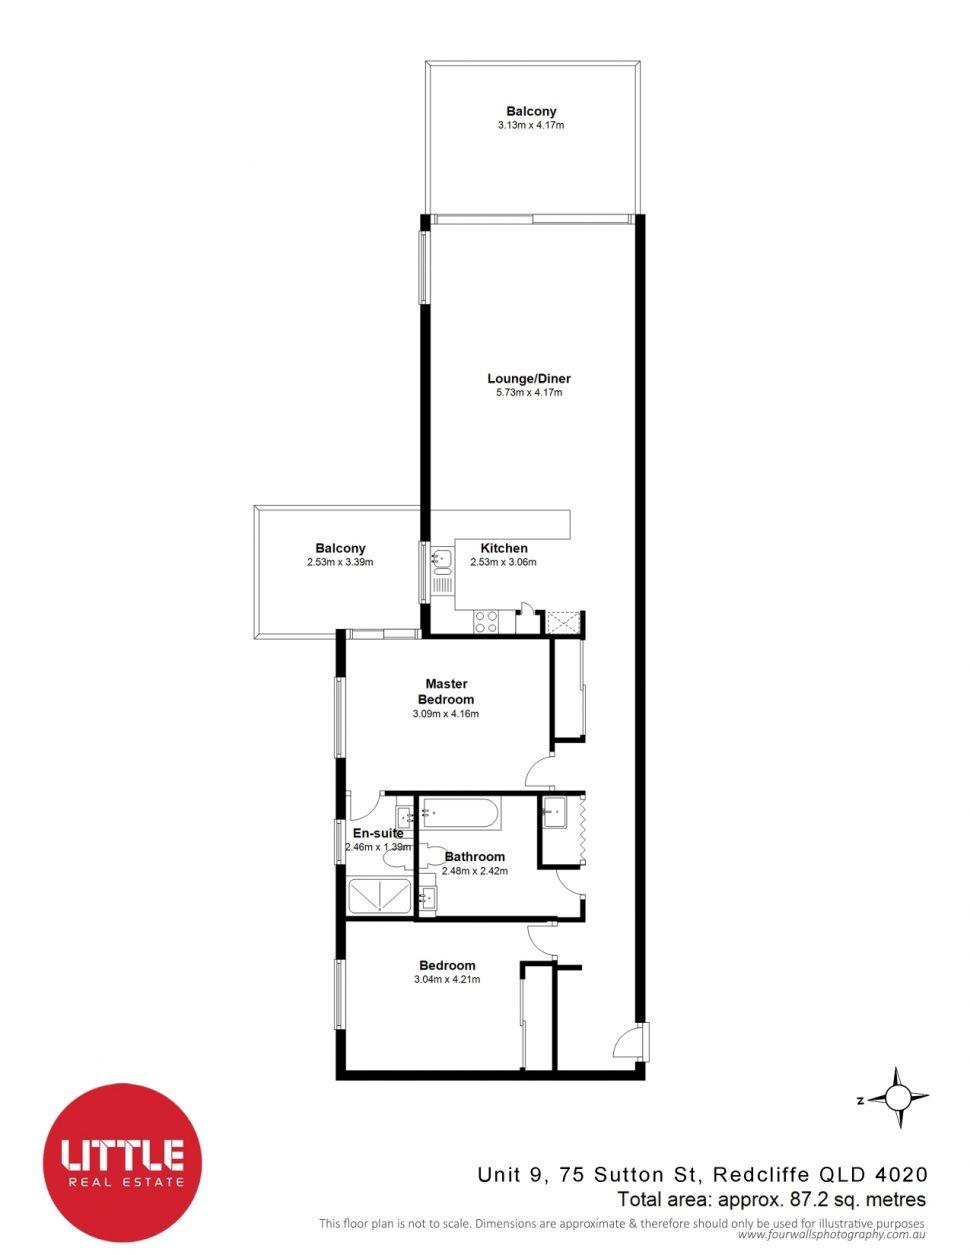 41218354 1630643393 21676 Floorplan Unit975 Sutton St Redcliffe Qld4020Page 0001